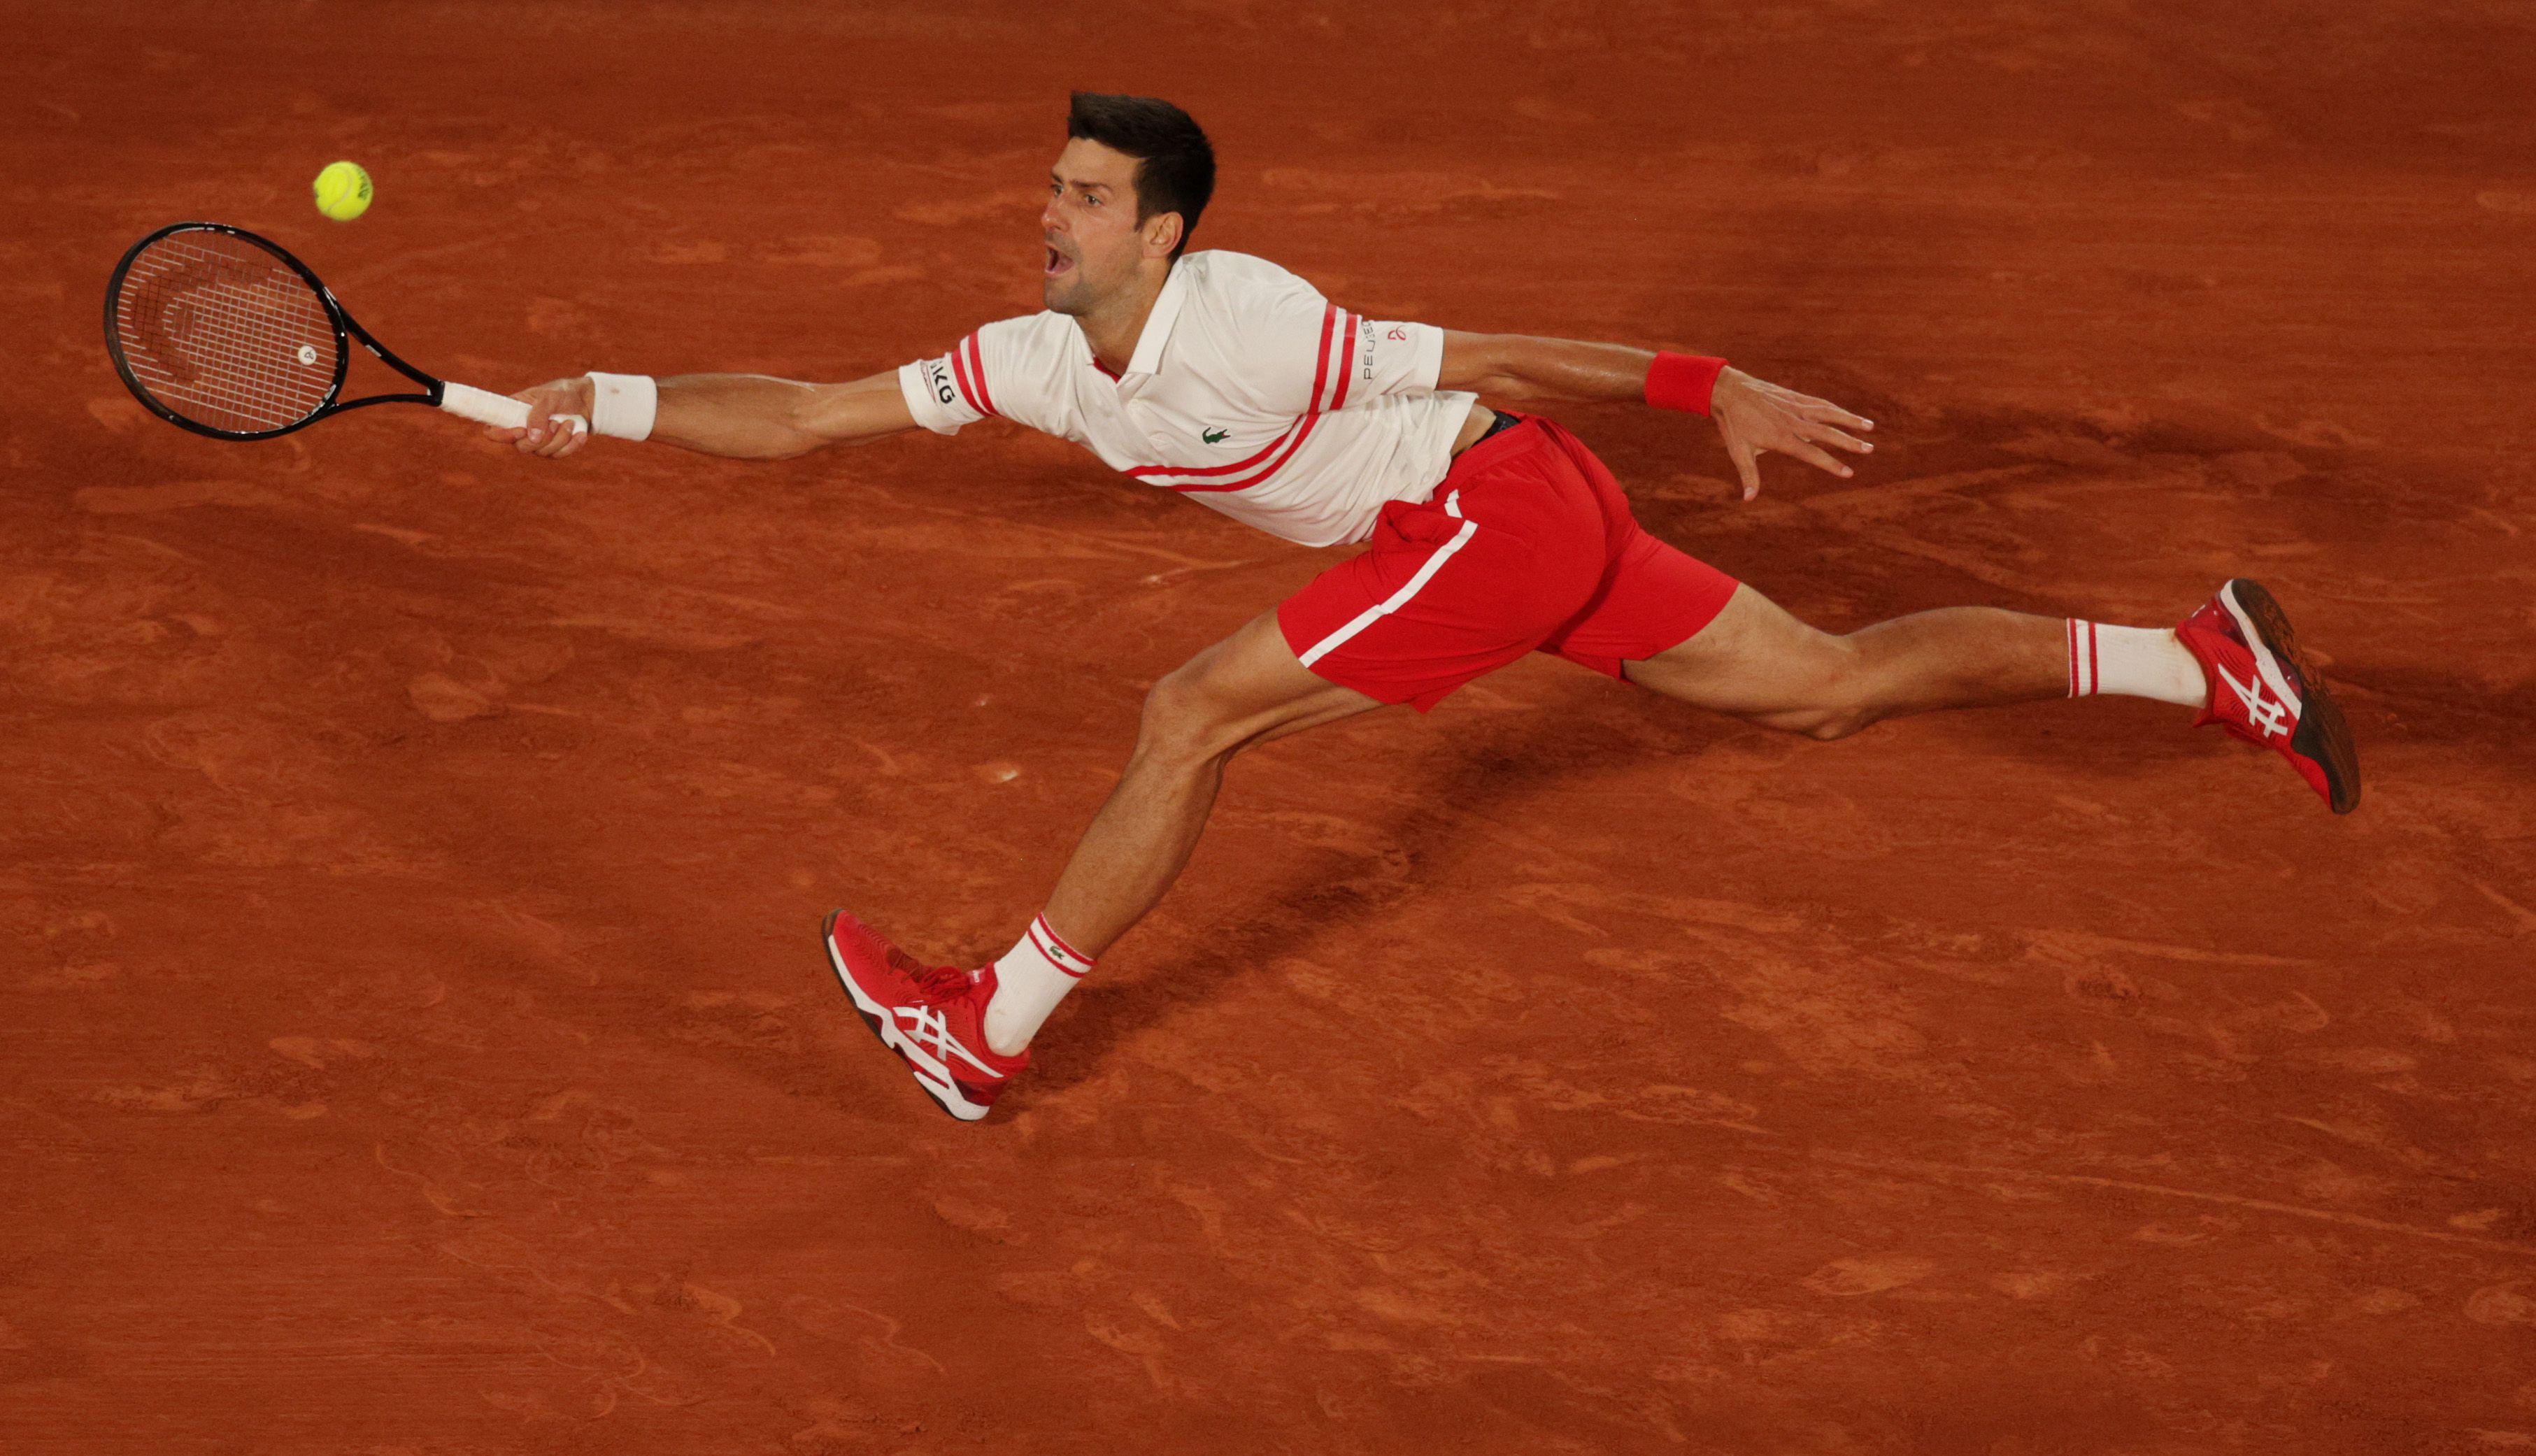 Novak Djokovic beats Nadal in Roland Garros thriller to reach final